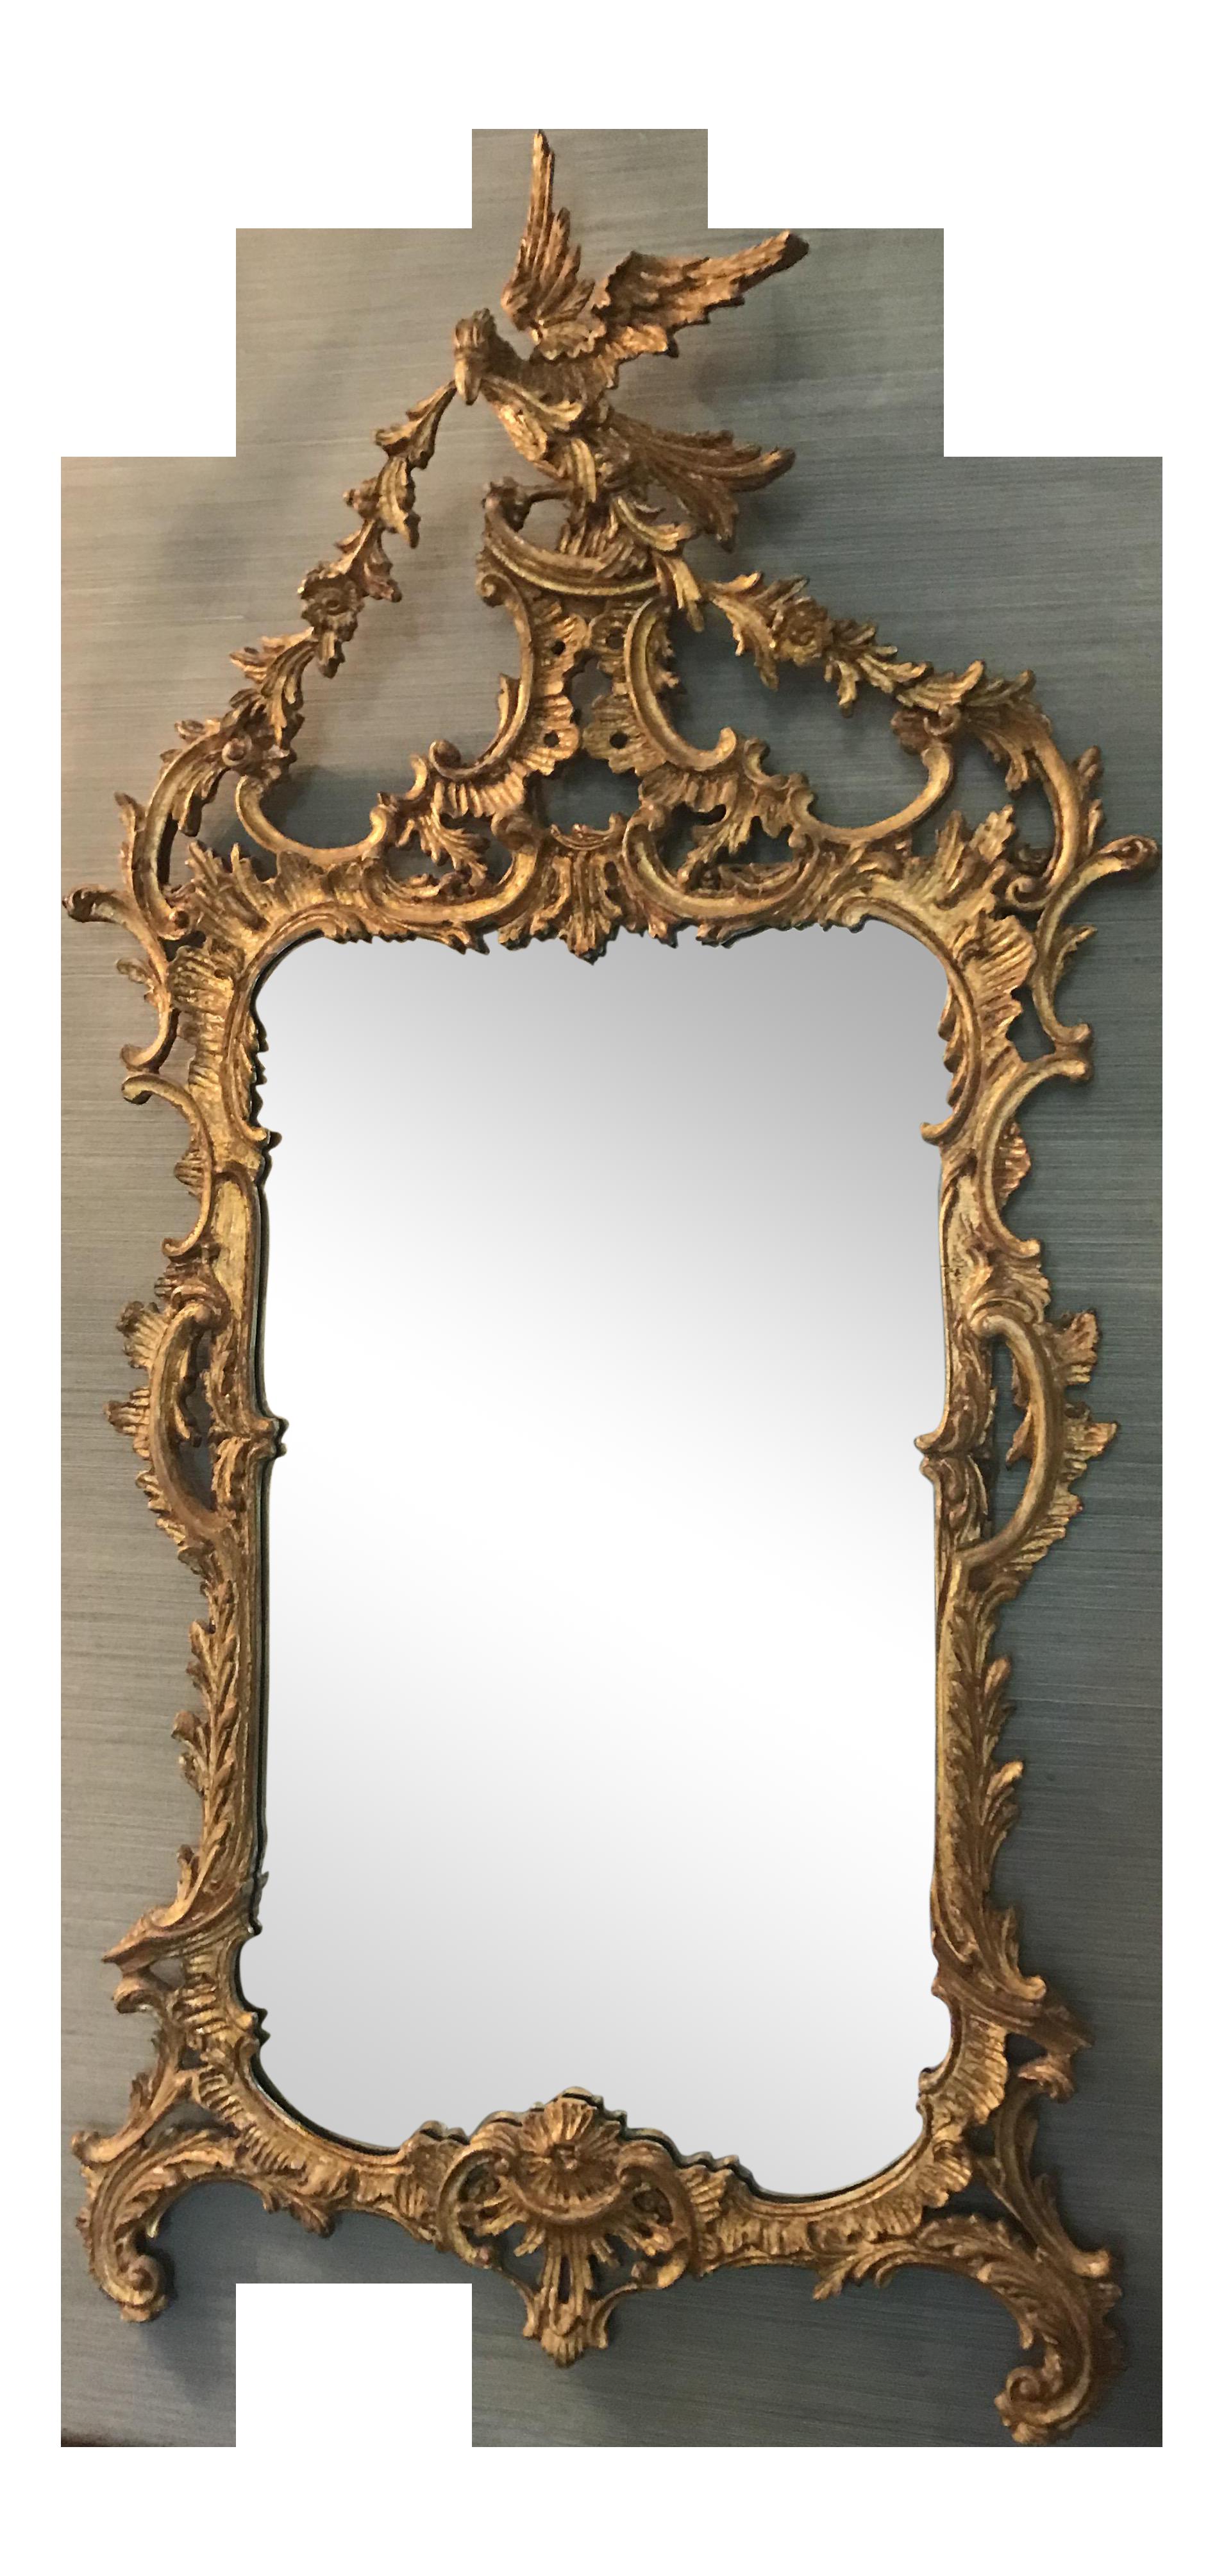 Reflection clipart big mirror, Reflection big mirror Transparent ... clip library